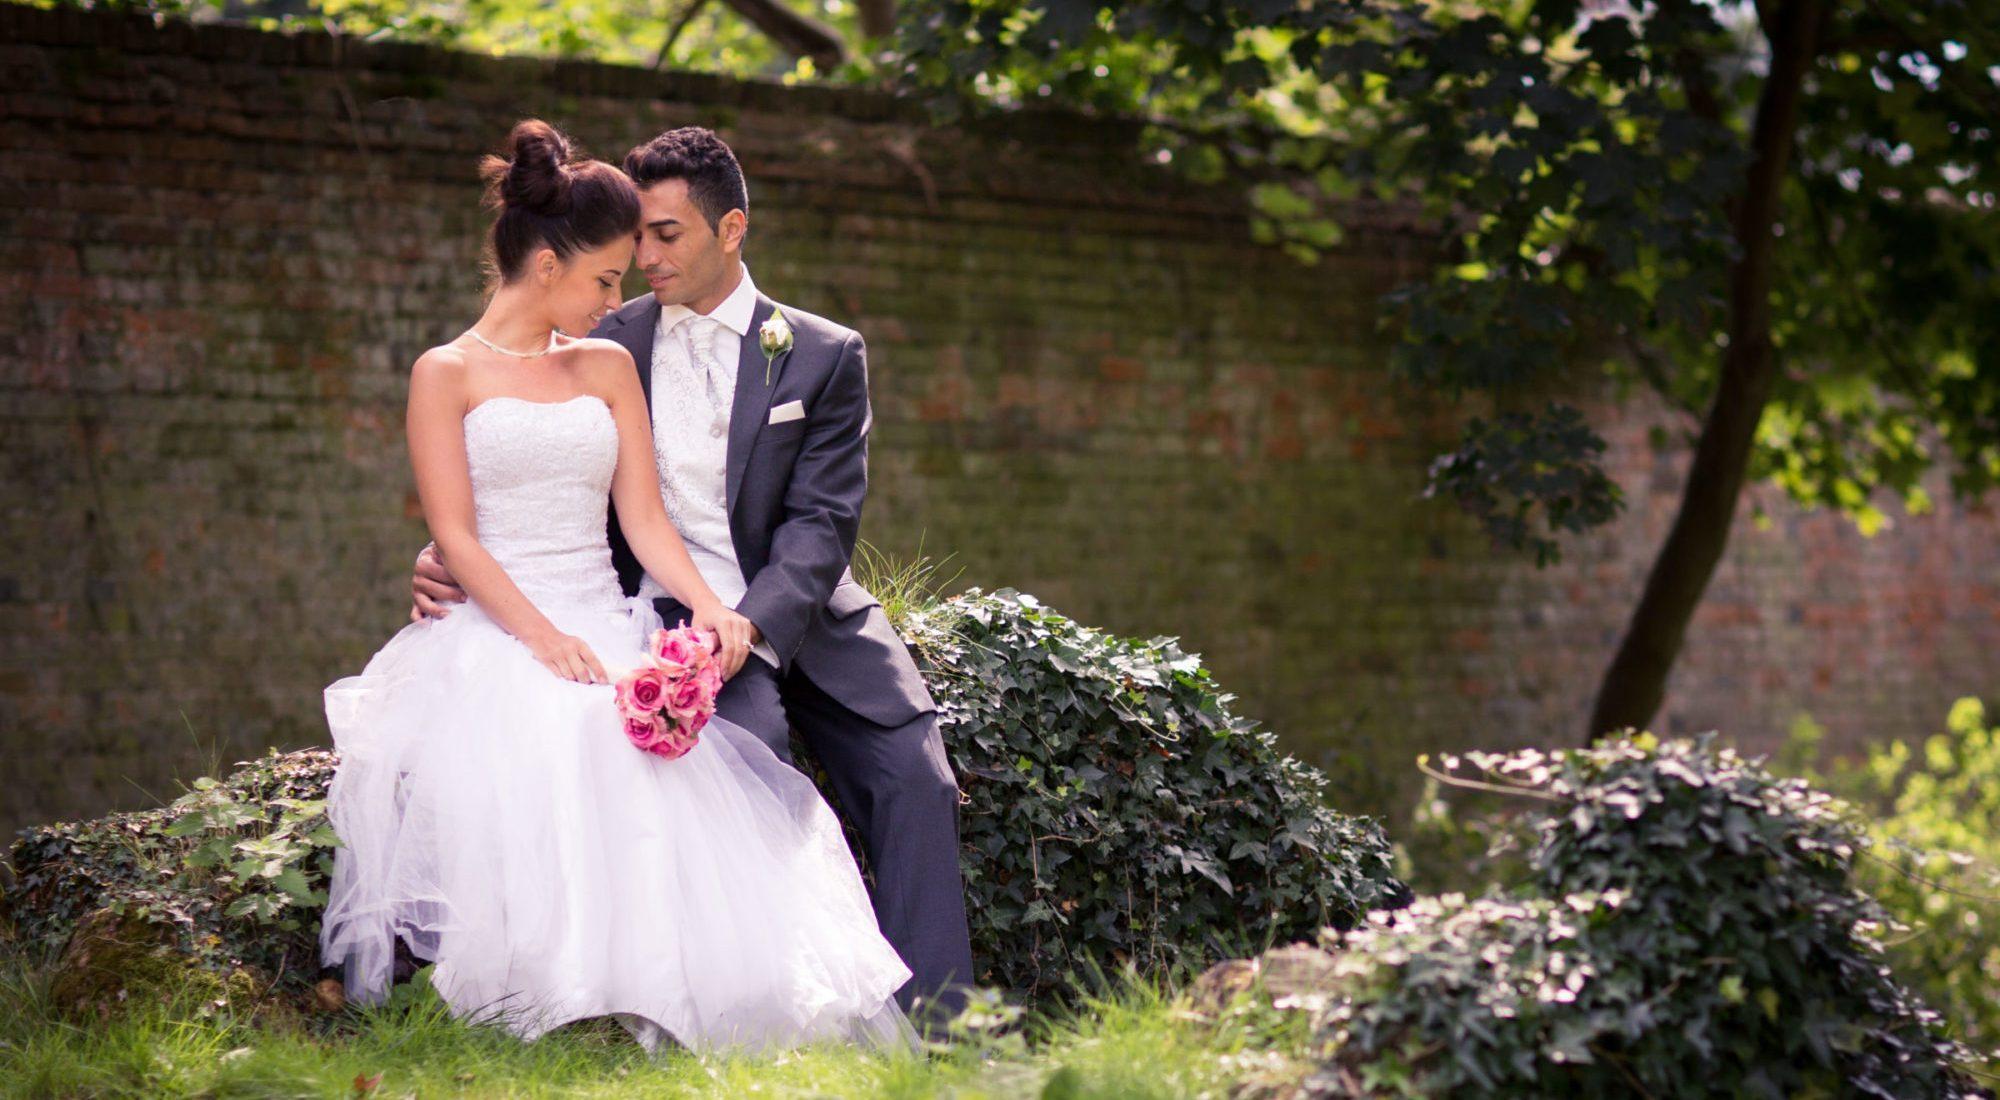 groom embraces bride buckinghamshire garden oxfordshire wedding photographer